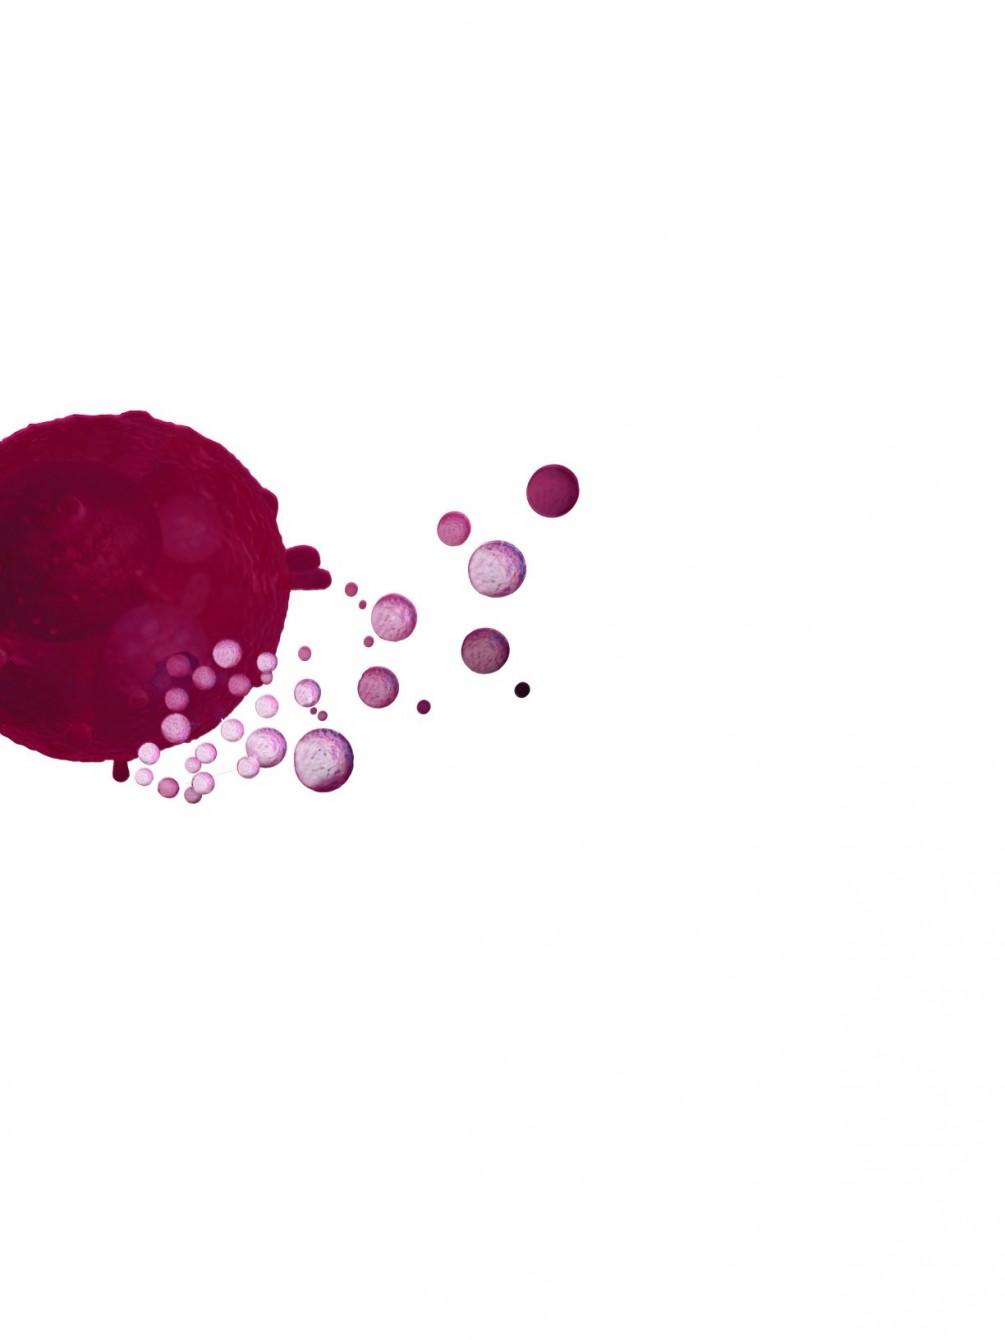 Exosome/EVs 胞外體是什麼?為什麼要研究?